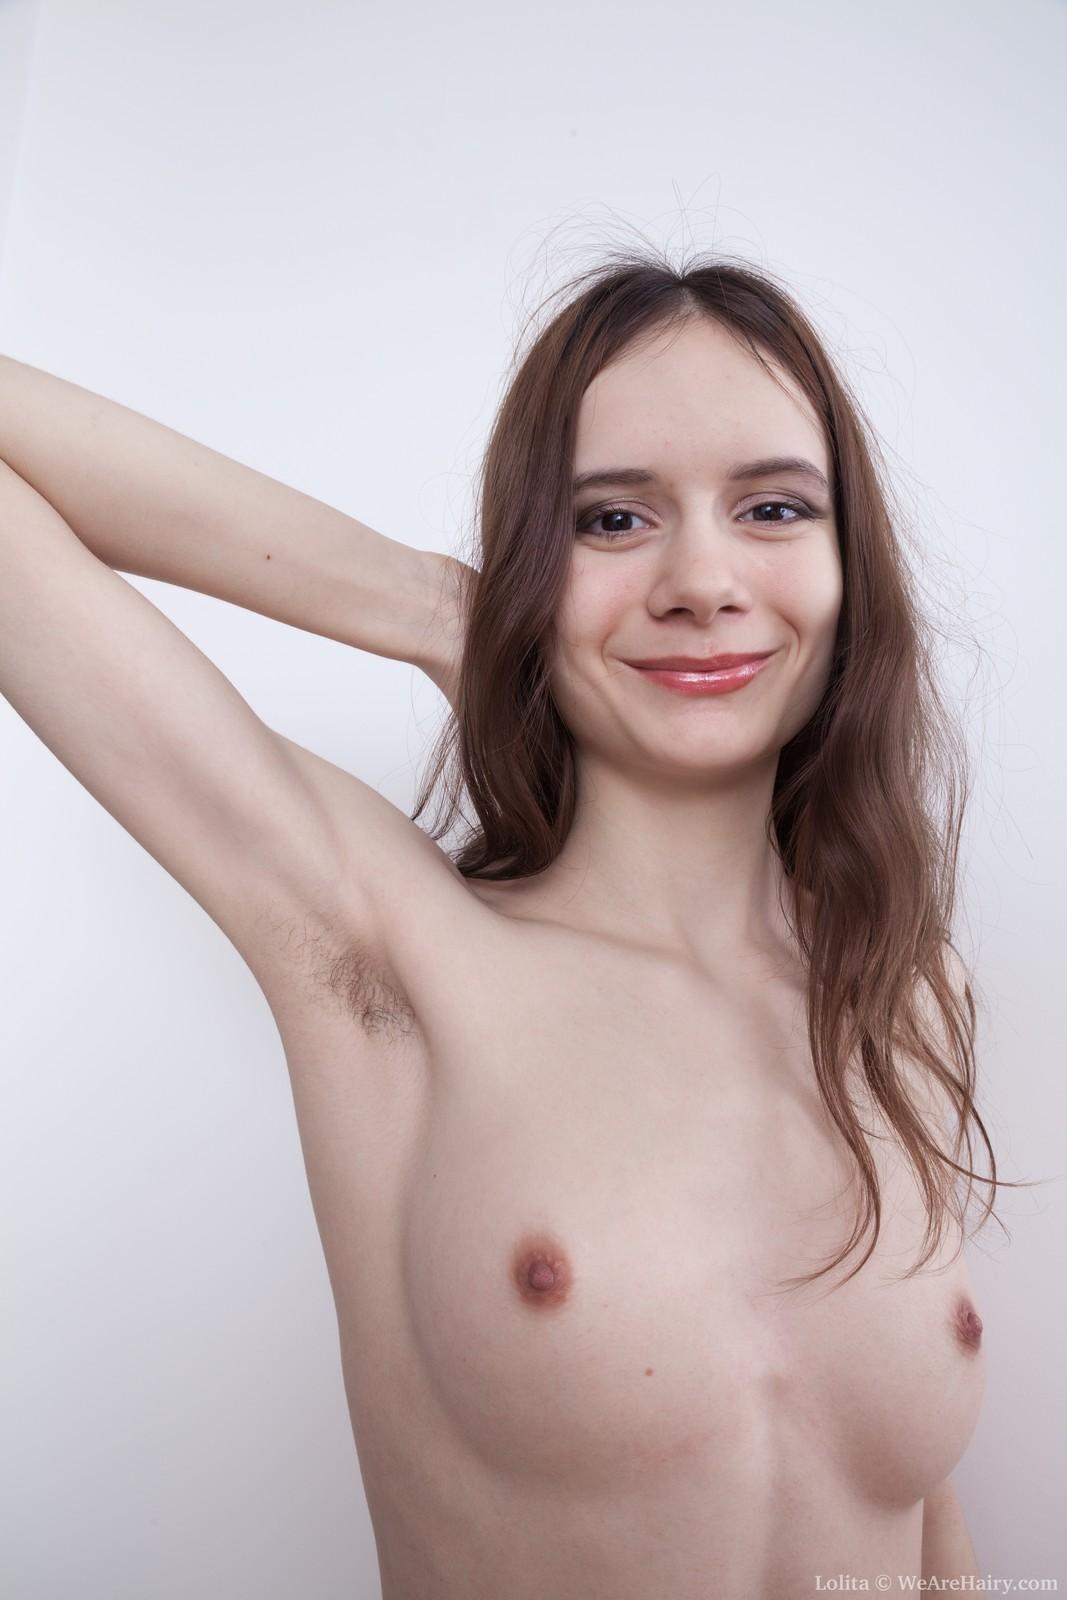 lolita-strips-and-masturbates-after-stargazing5.jpg